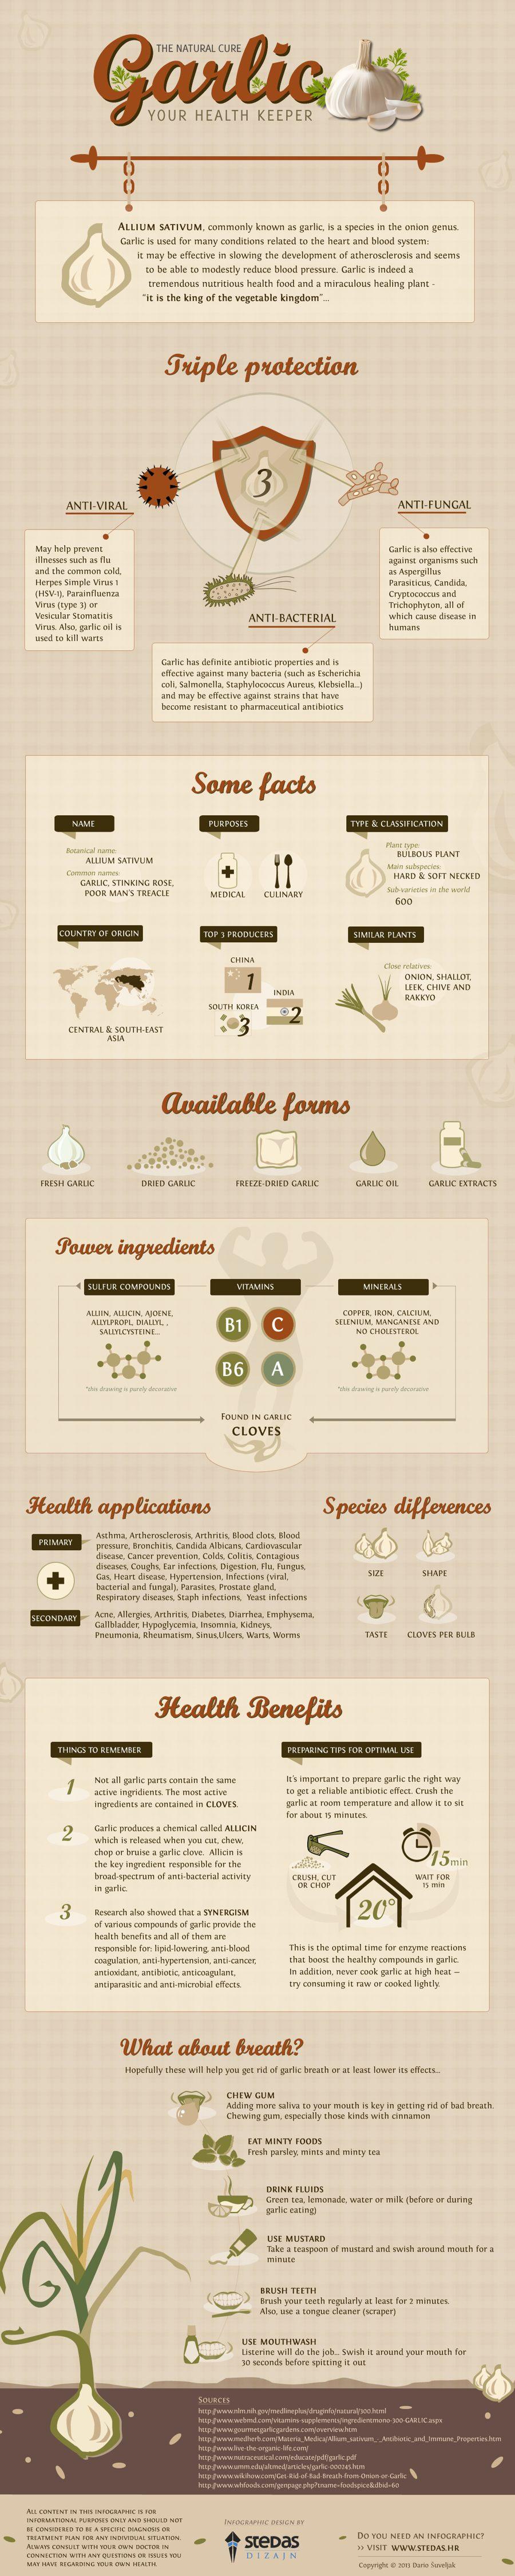 Health Benefits Of Garlic 8